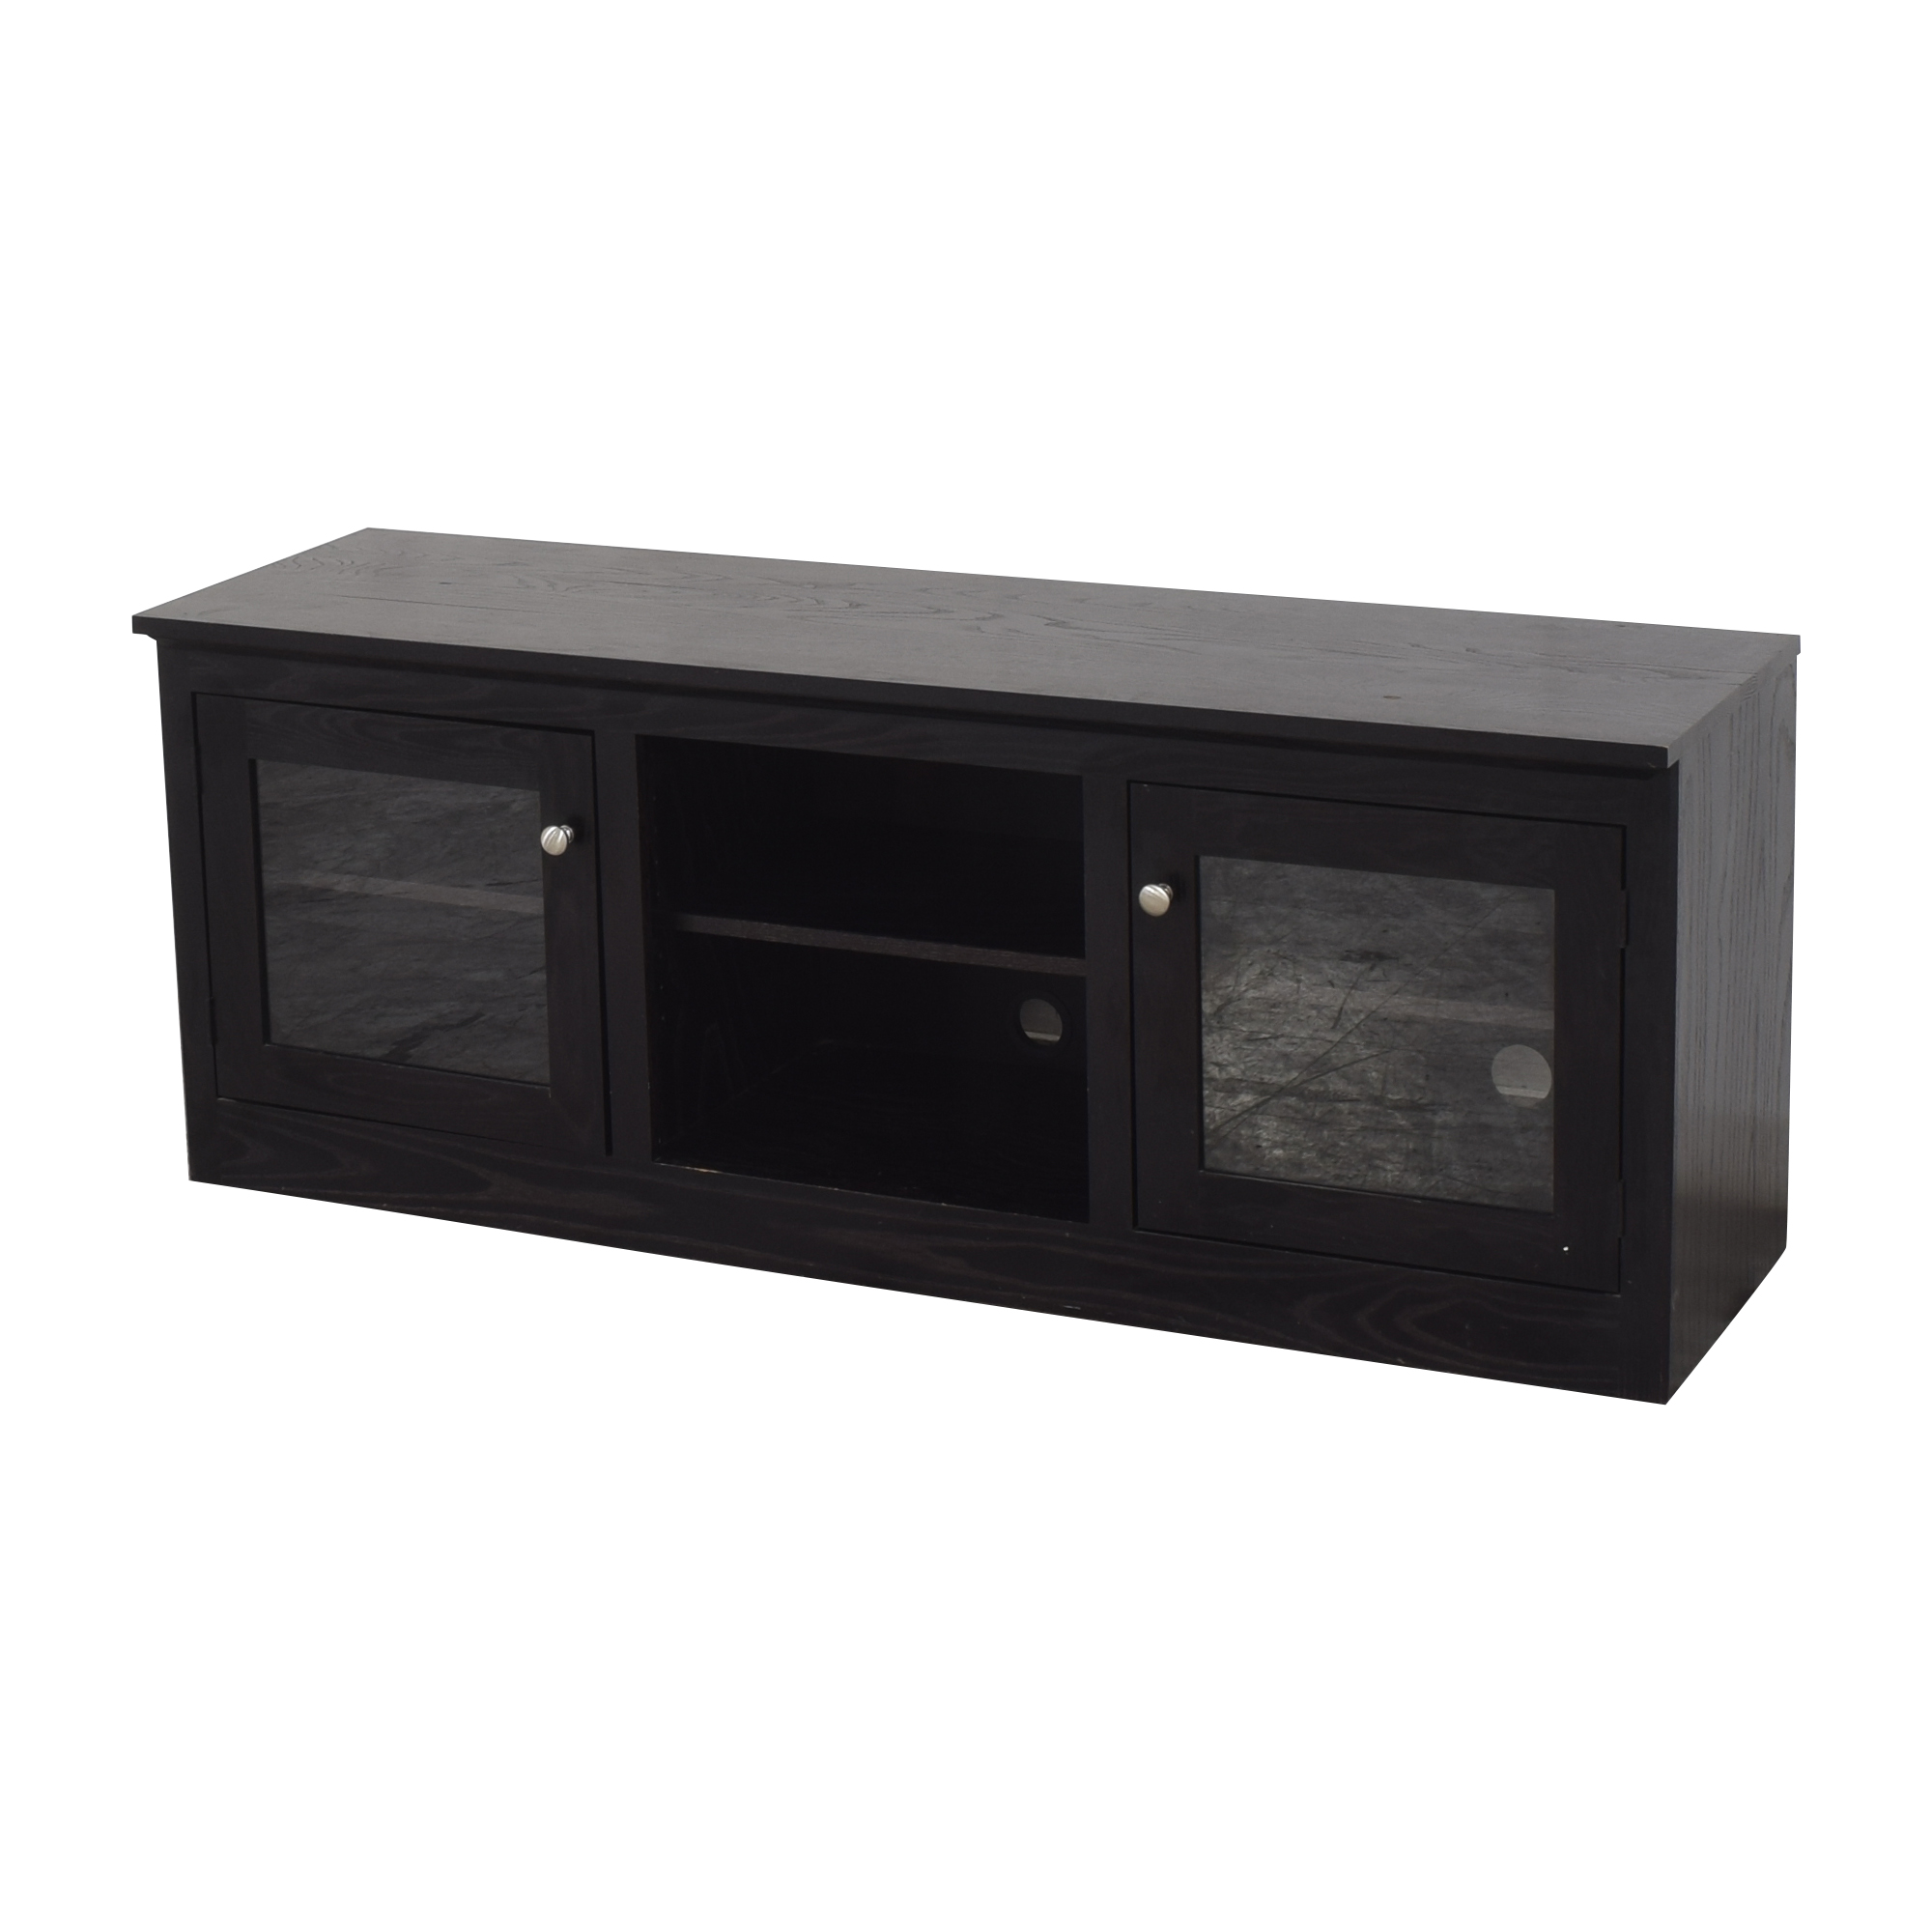 Crate & Barrel Crate & Barrel Media Console price